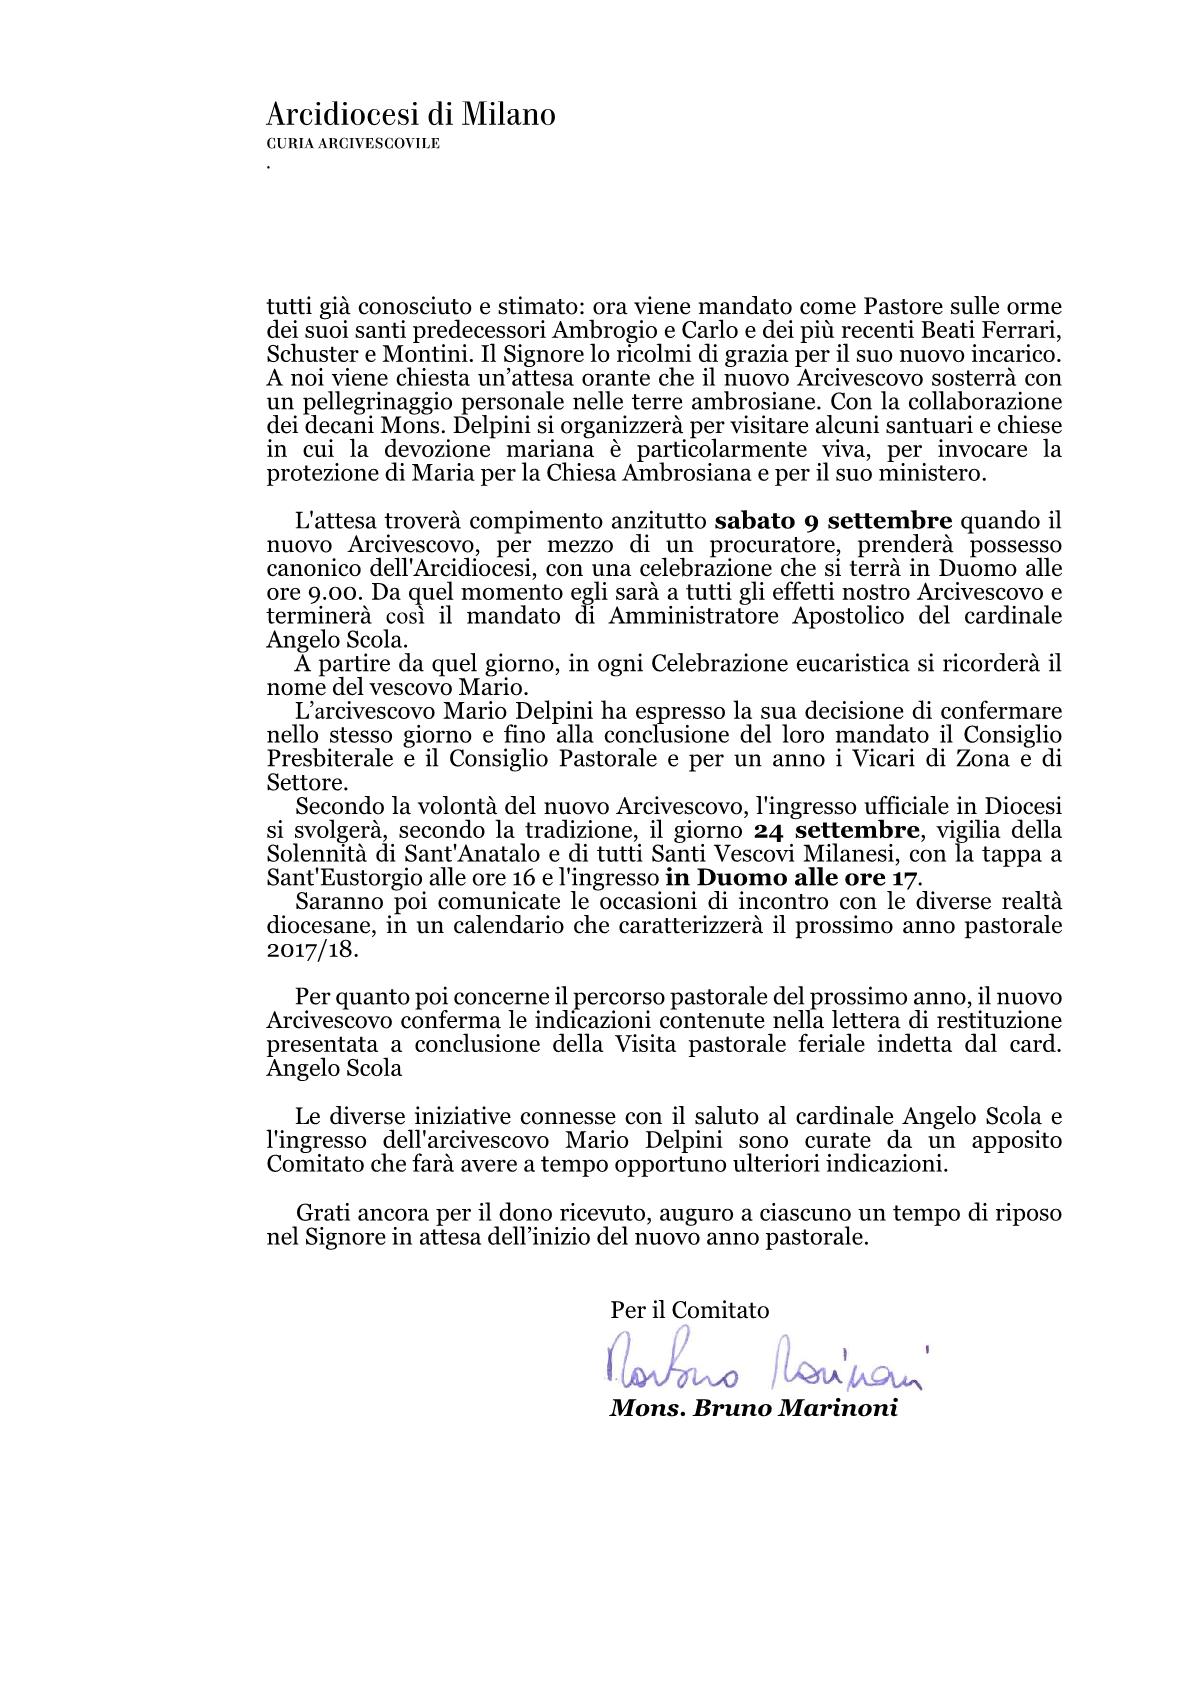 lettera curia milanese2